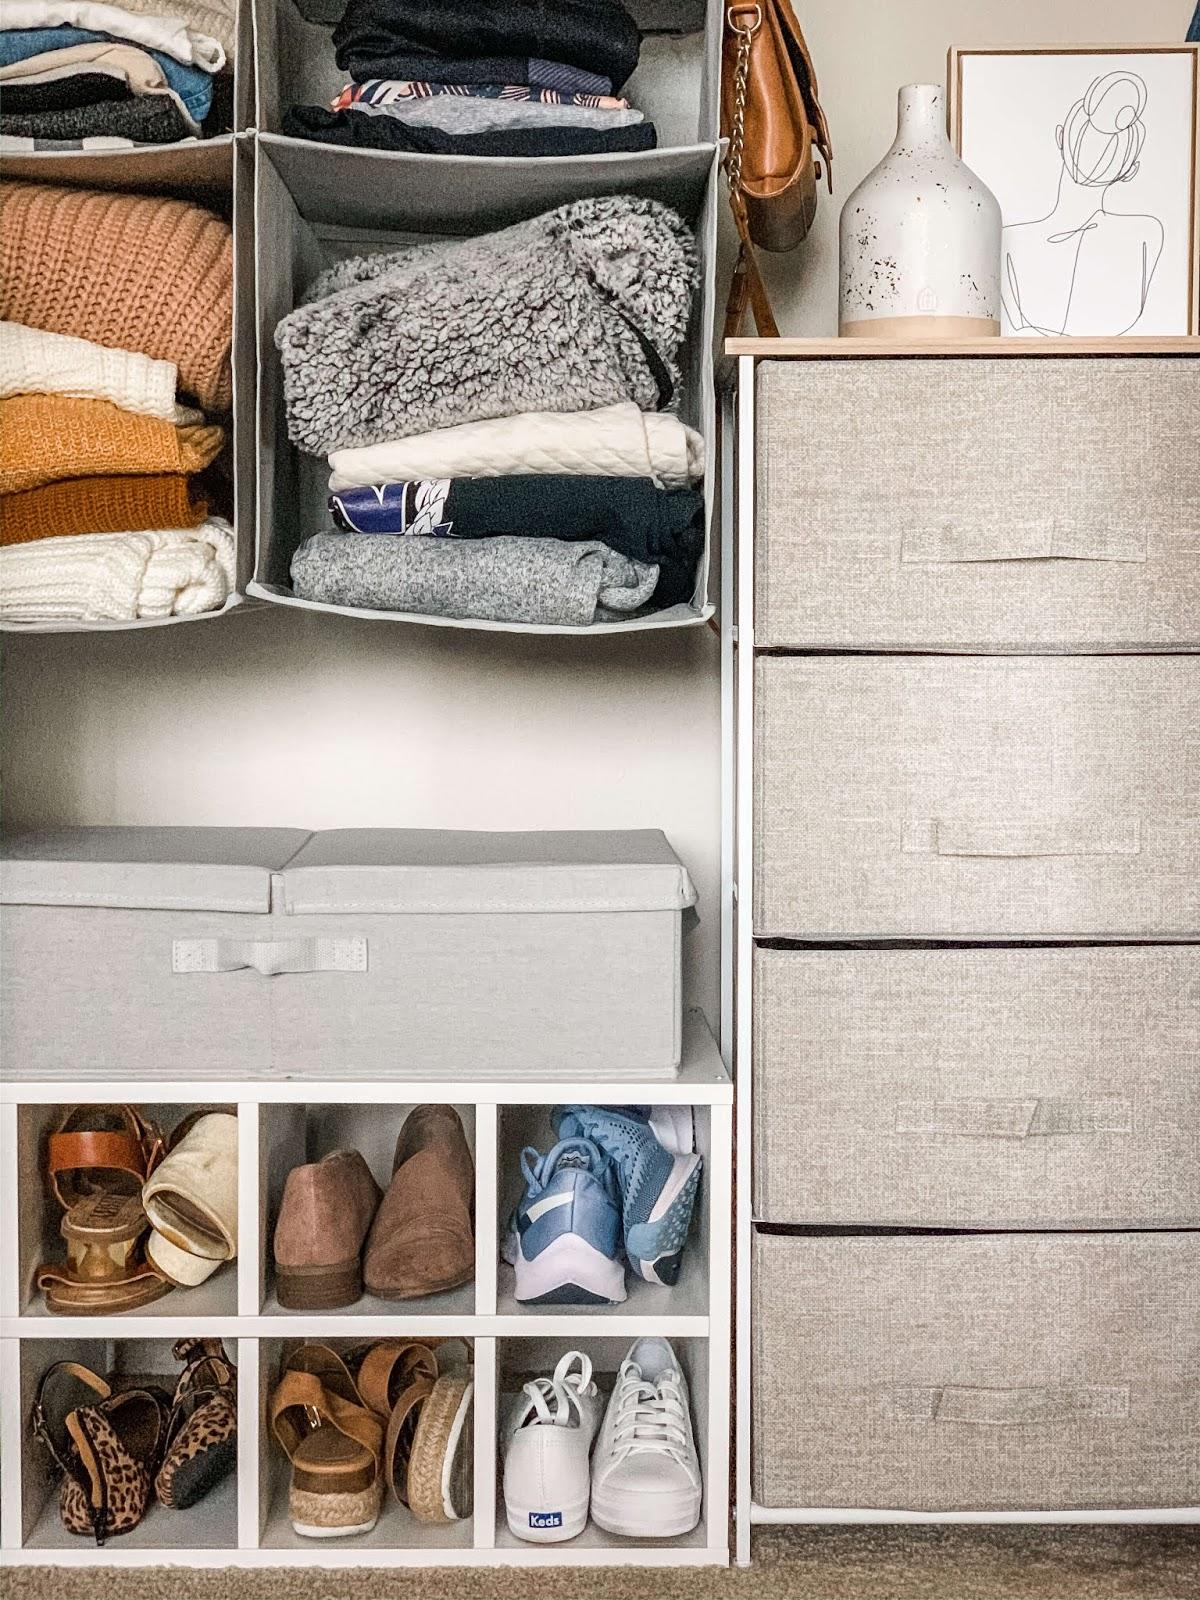 My organized bedroom closet